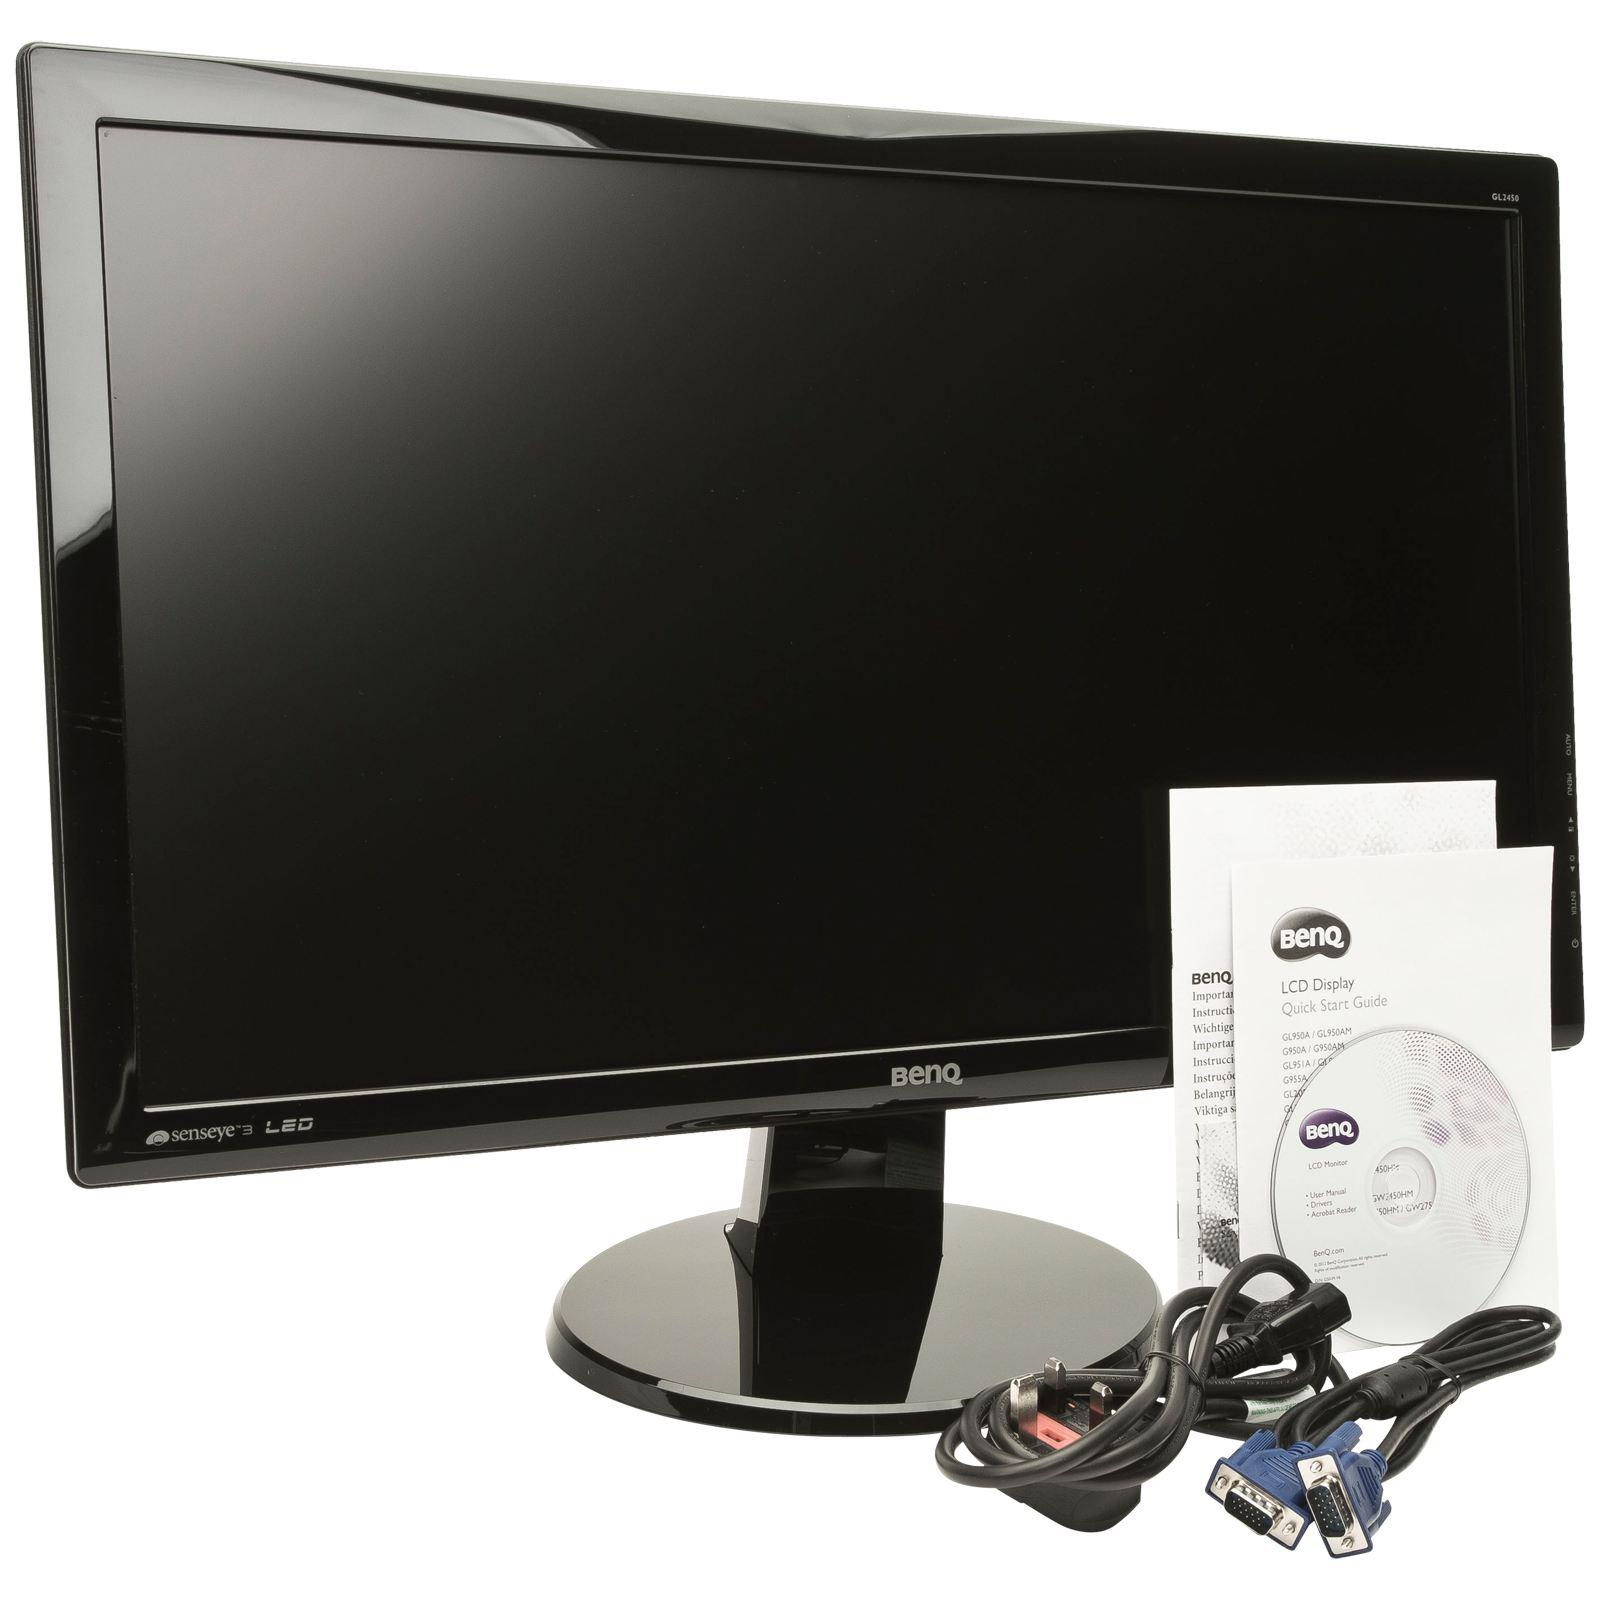 BenQ | GL2450 | GL2450 | 24 inch | LED | 1920 x 1080 pixeli | 16:9 | 250 cd/m² | 12000000:1 | 5 ms | Dimensiune punct 0.276 mm | Unghi vizibilitate 170/160 ° | D-Sub | DVI | Kensington lock | Negru | HDCP | OSD Language | Senseye 3